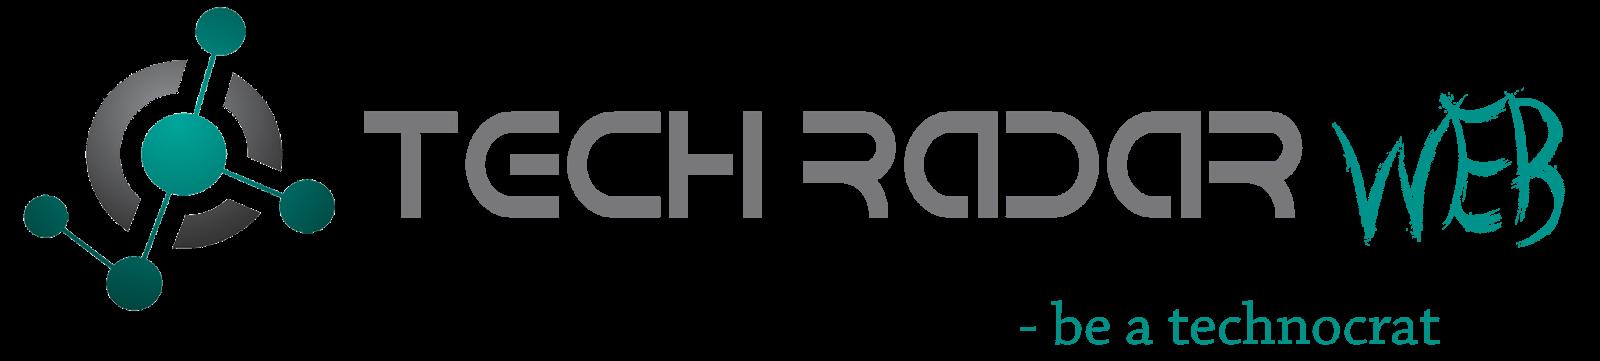 110) Submit a Guest Post ~ Tech Radar Web